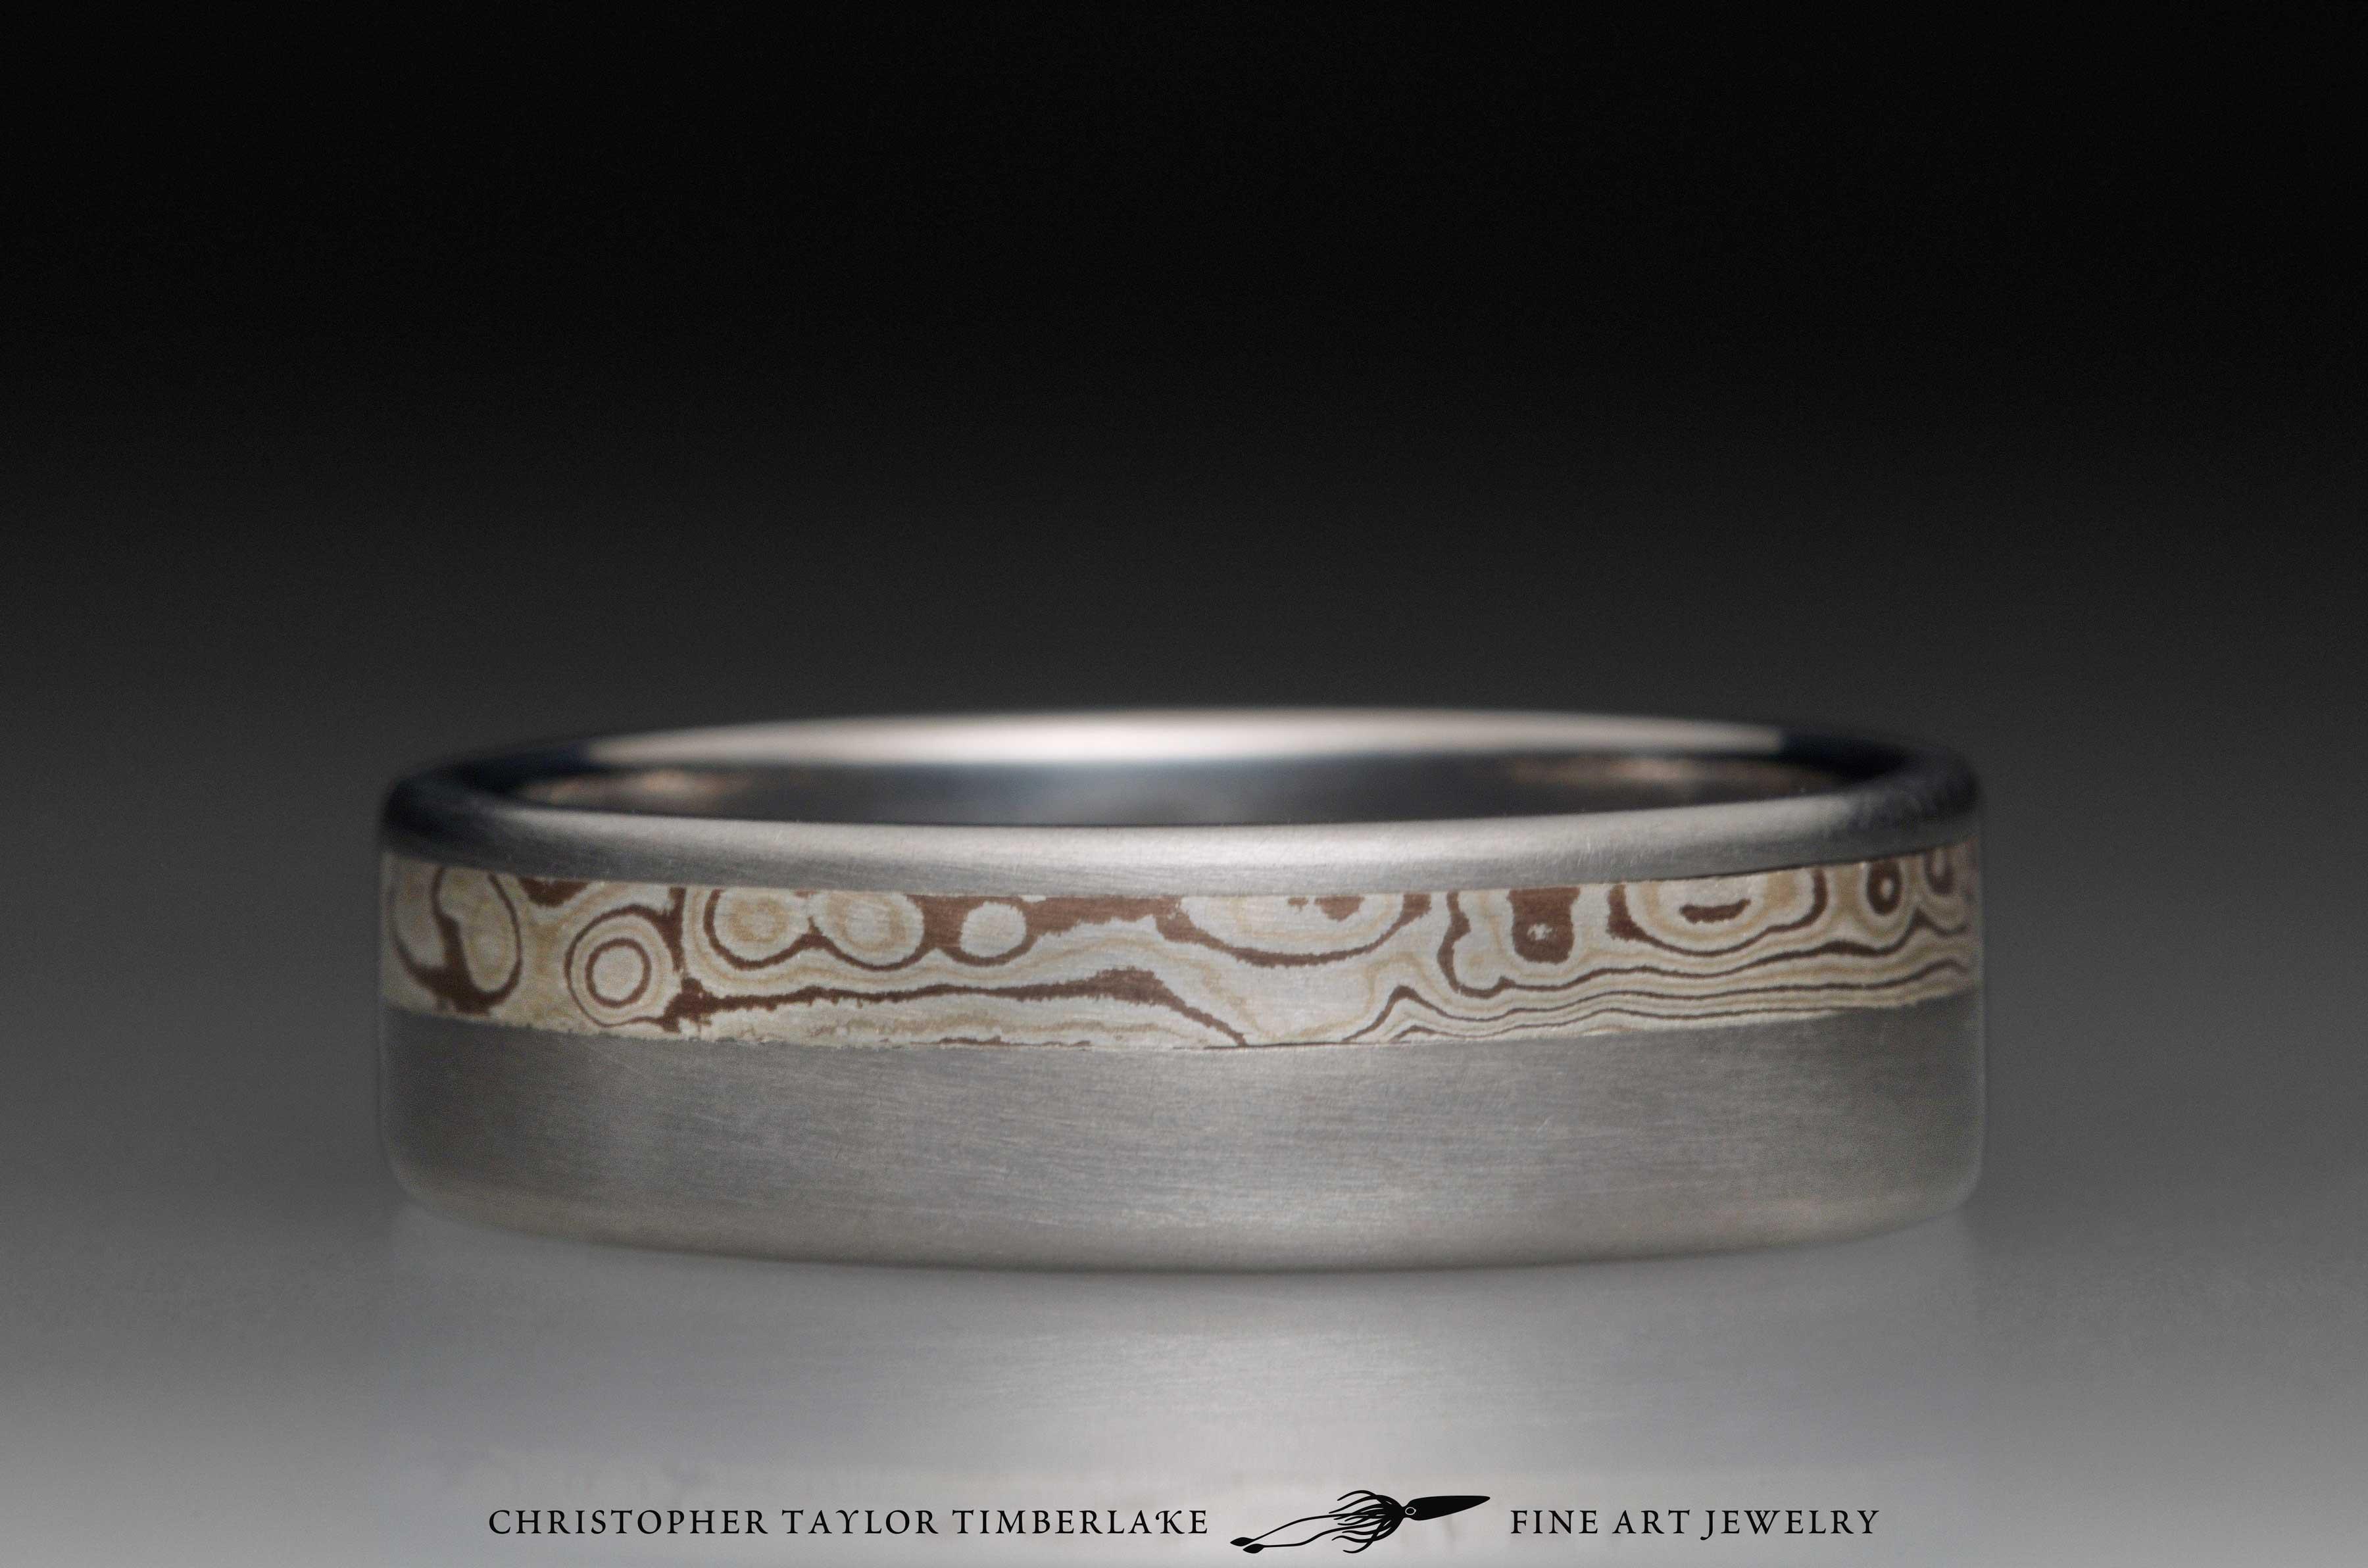 Mokume gane sterling silver, shakudo, and kogane inlay channel in titanium, 6.5mm (3.25-2.25-1) 2